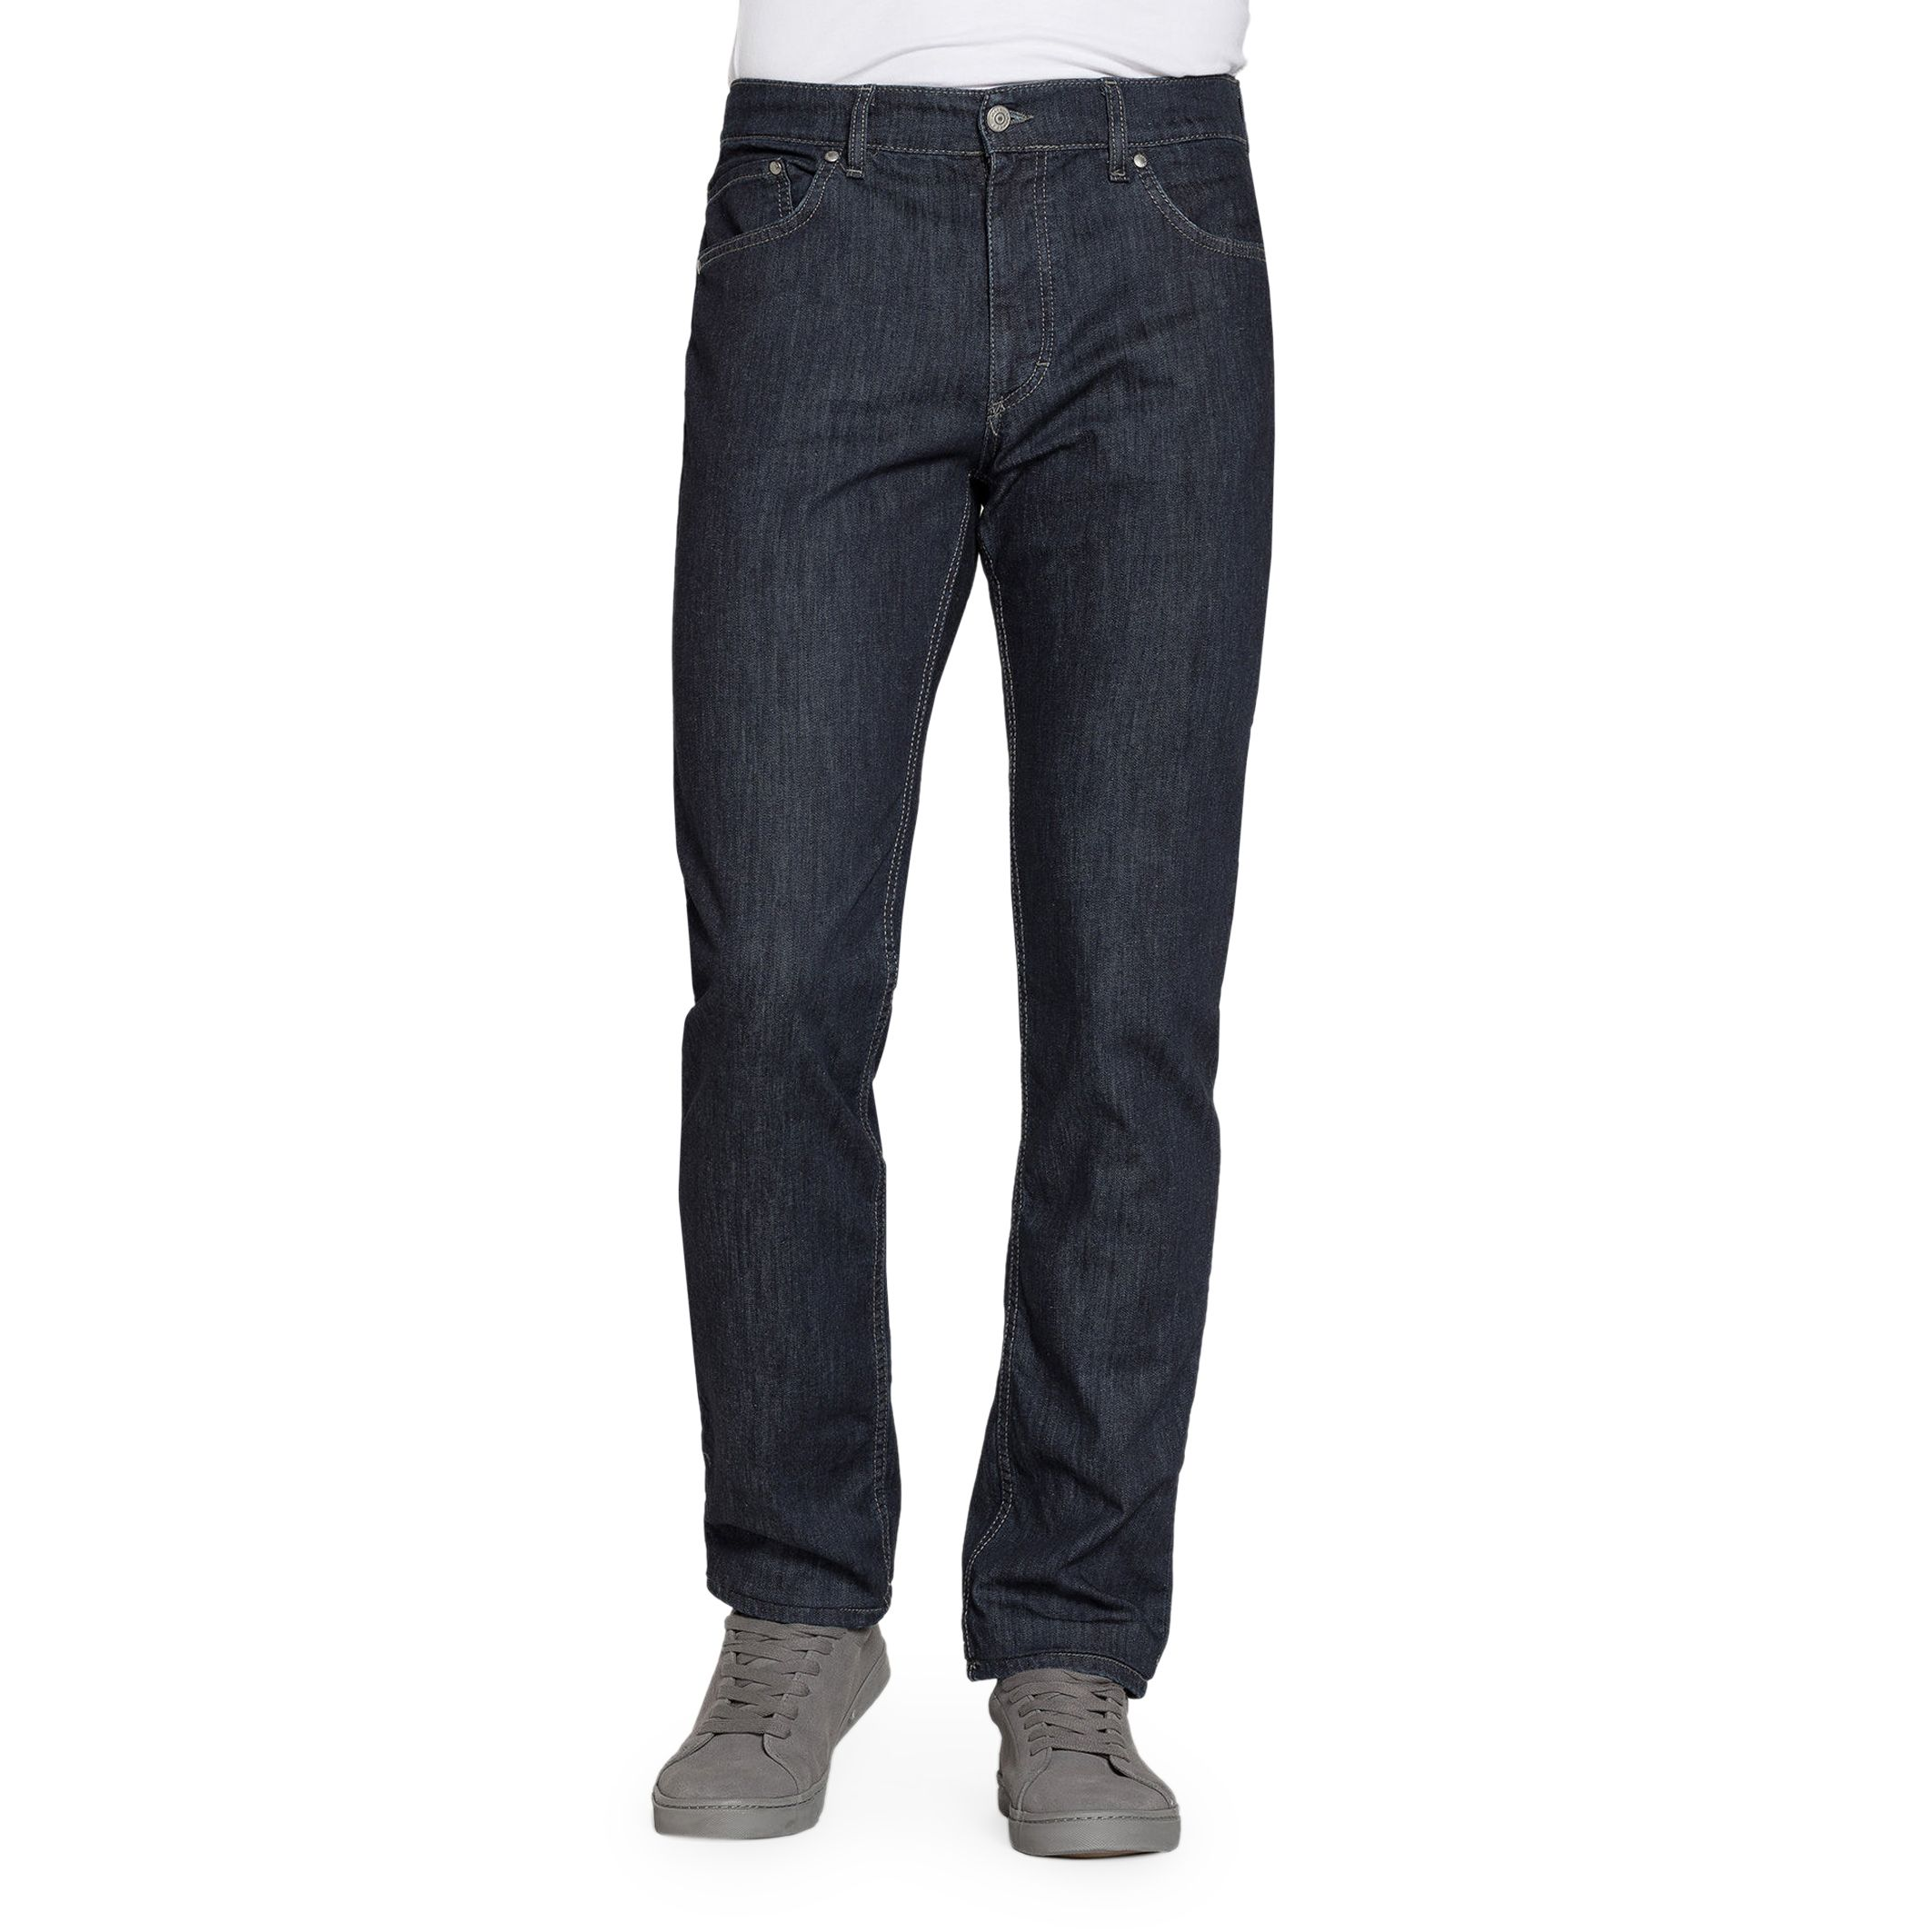 Carrera Jeans - 700-941A